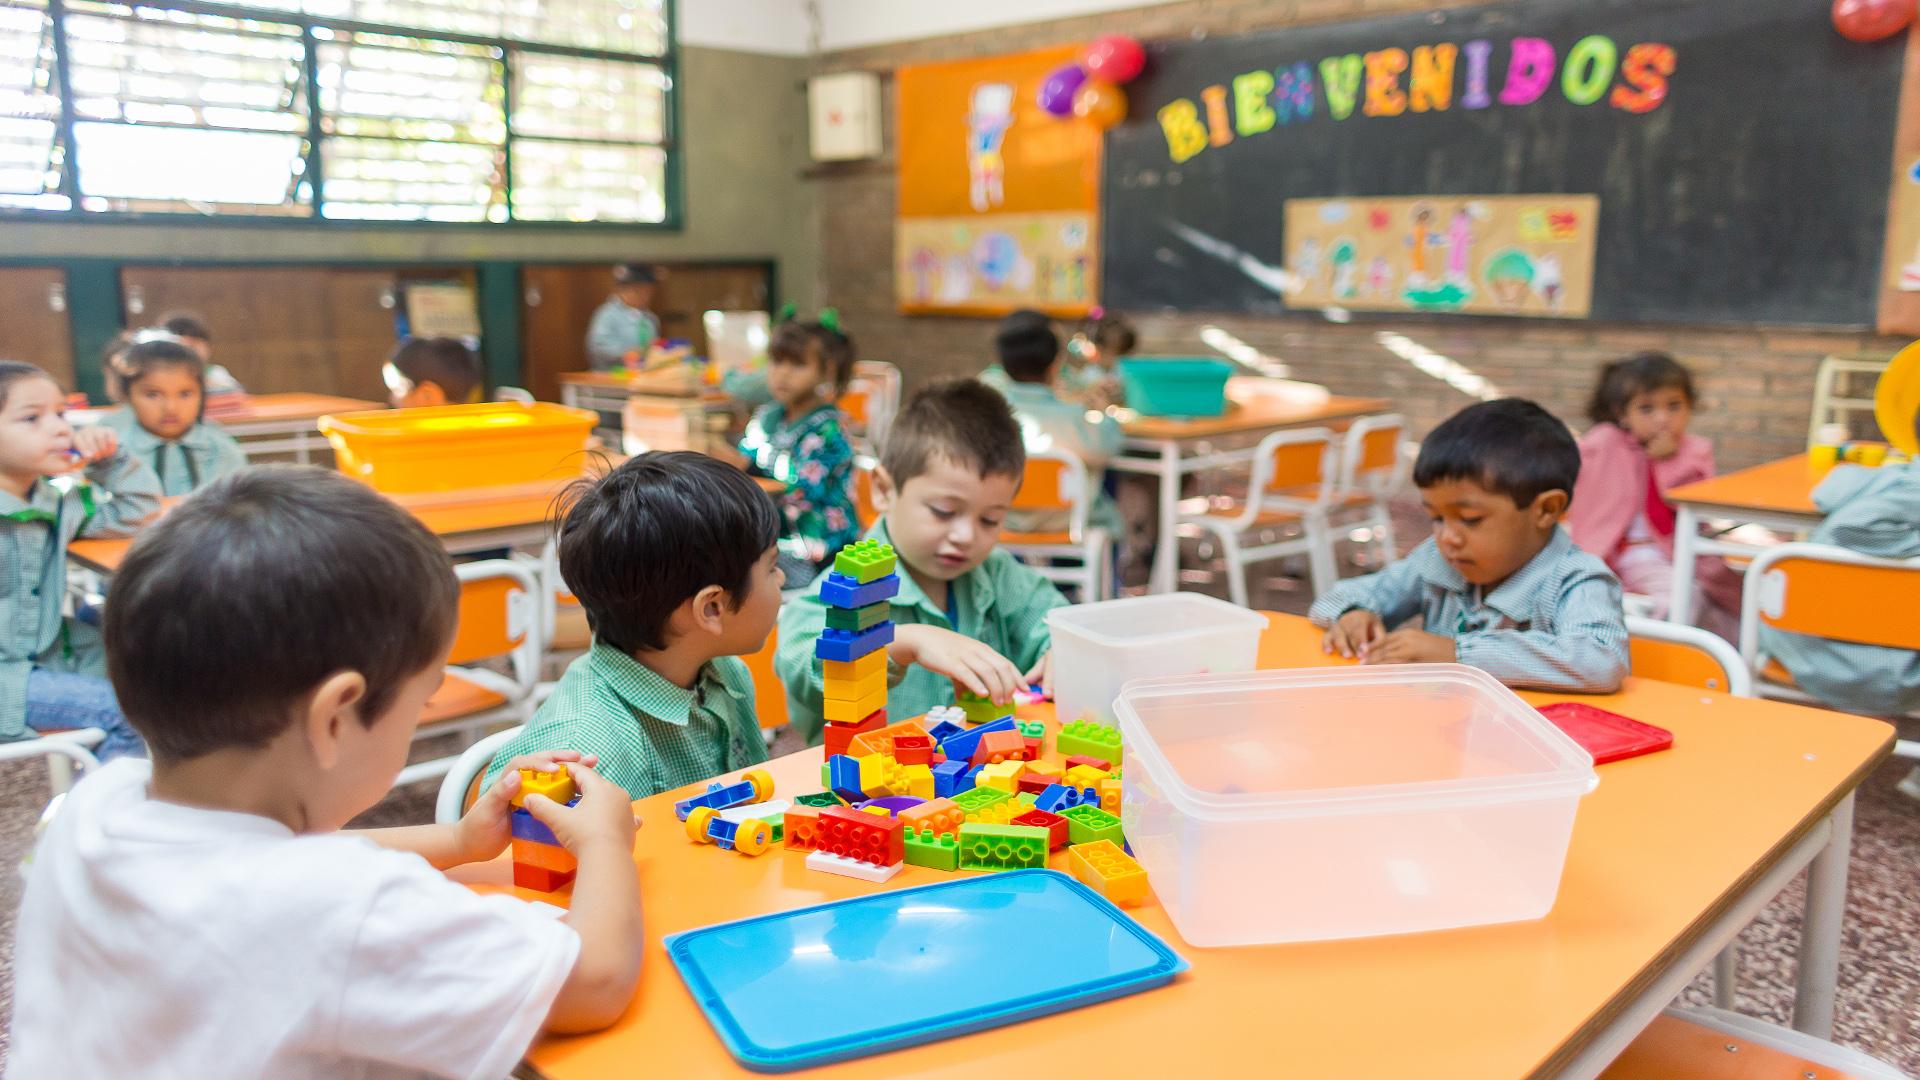 Apertura de licitaci n para escuela en jos de san mart n for Azul naranja jardin de infantes